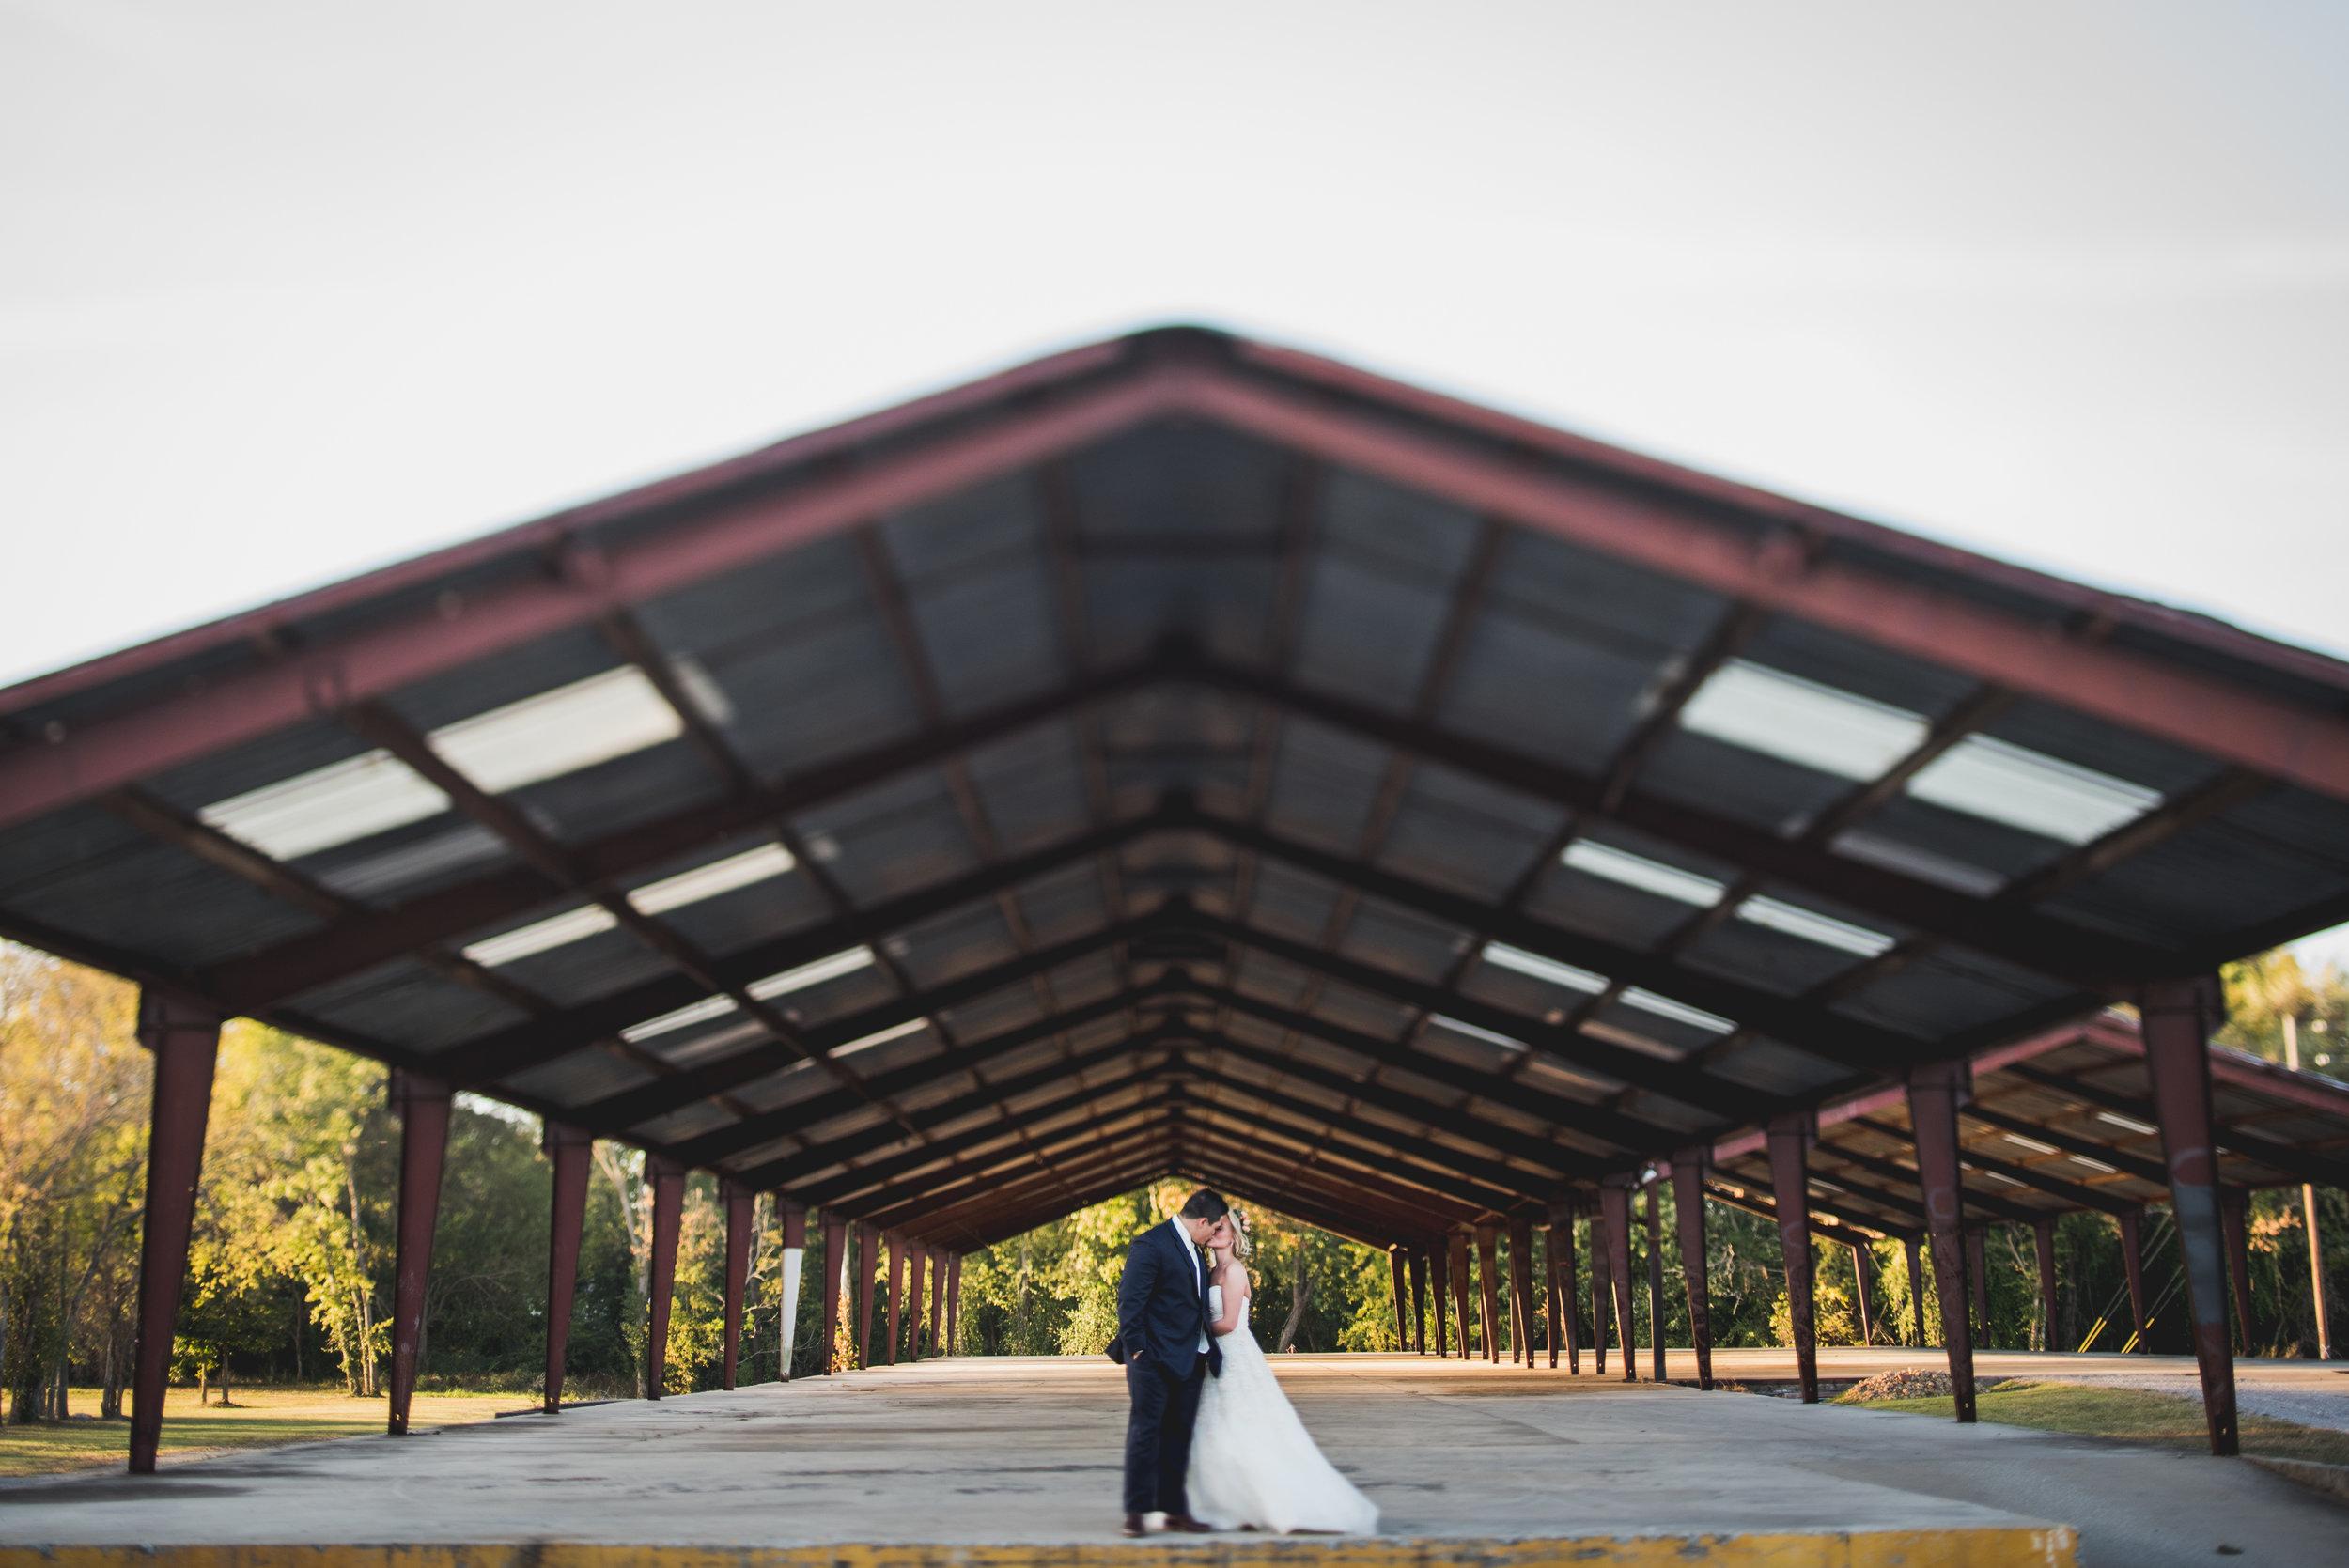 Nashville-wedding-photographers-CJ's-Off-The-Square-48.JPG